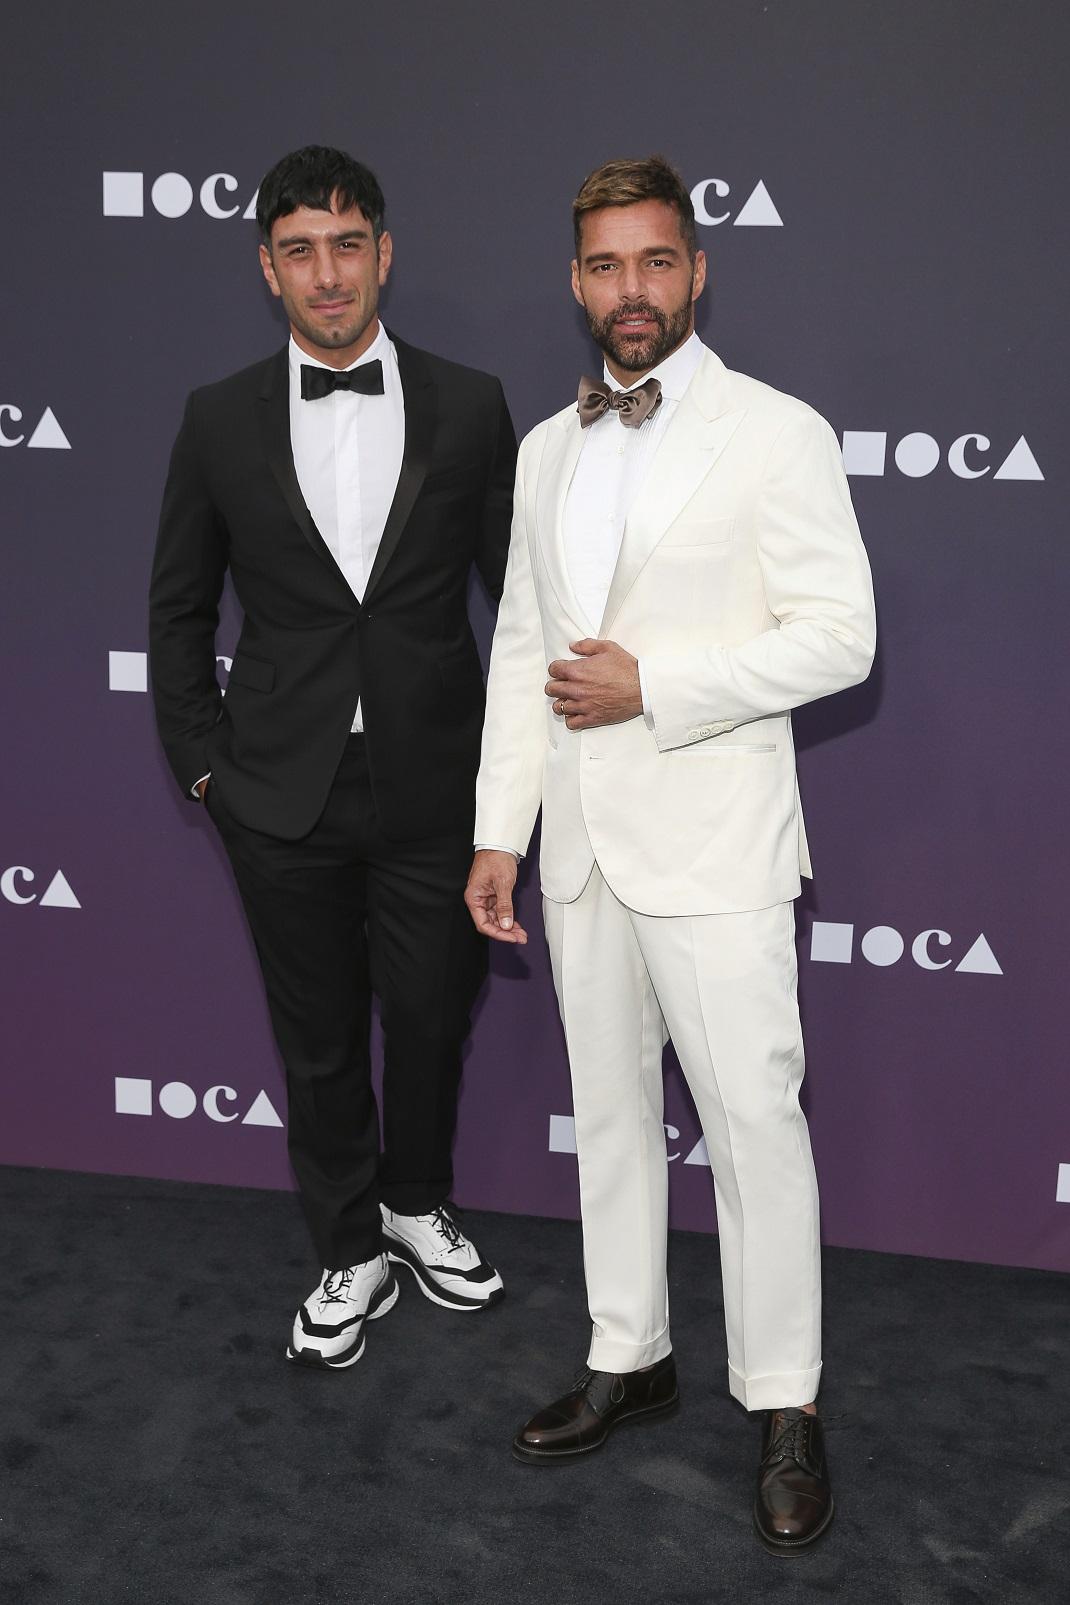 Jwan Yosef και Ricky Martin στο κόκκινο χαλί με κοστούμι